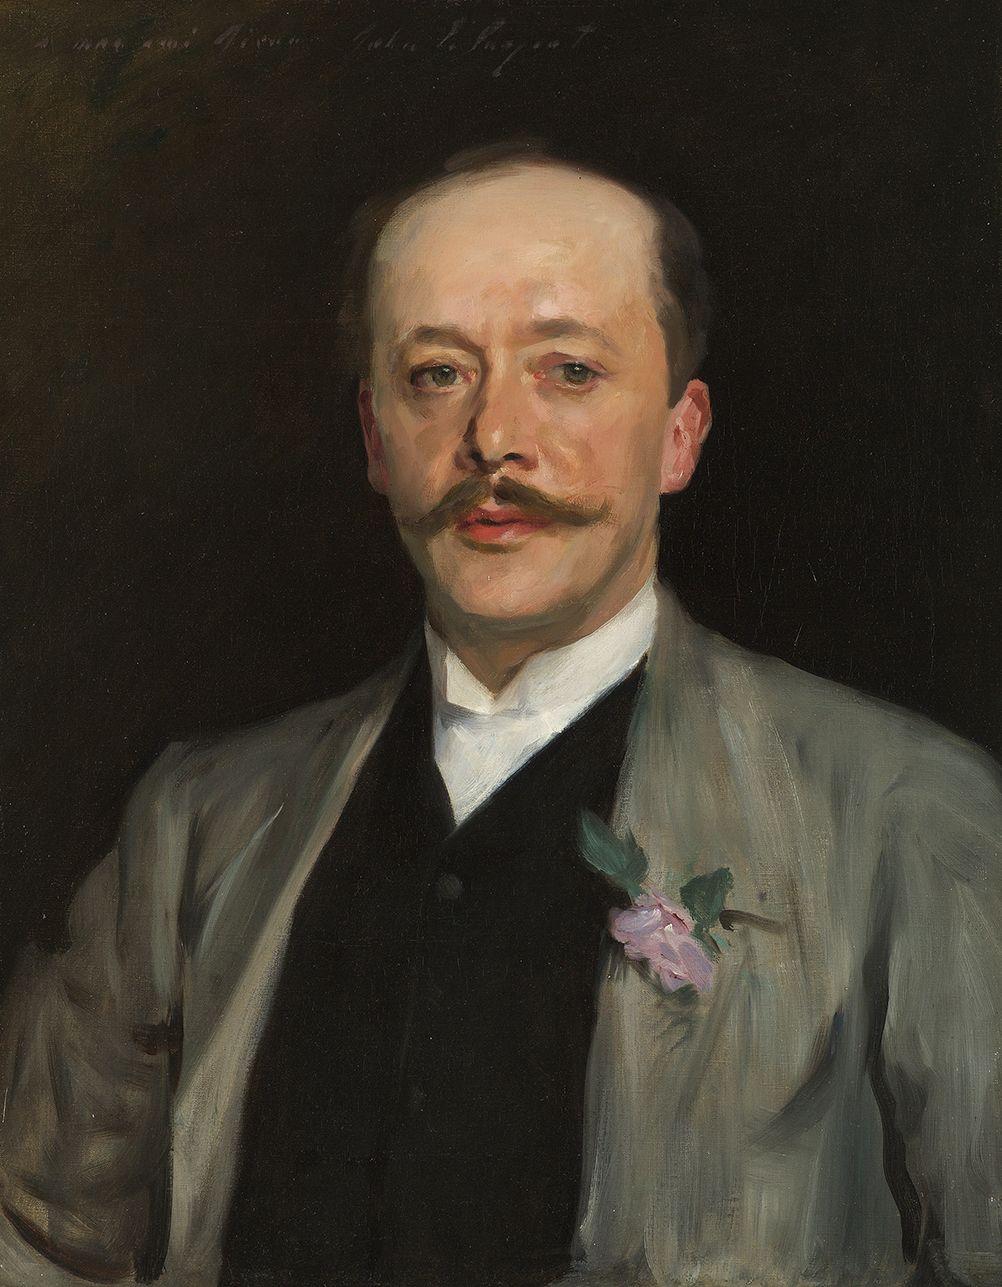 John Singer Sargent (1856-1925), Portrait of Charles Alexander Giron, circa 1884